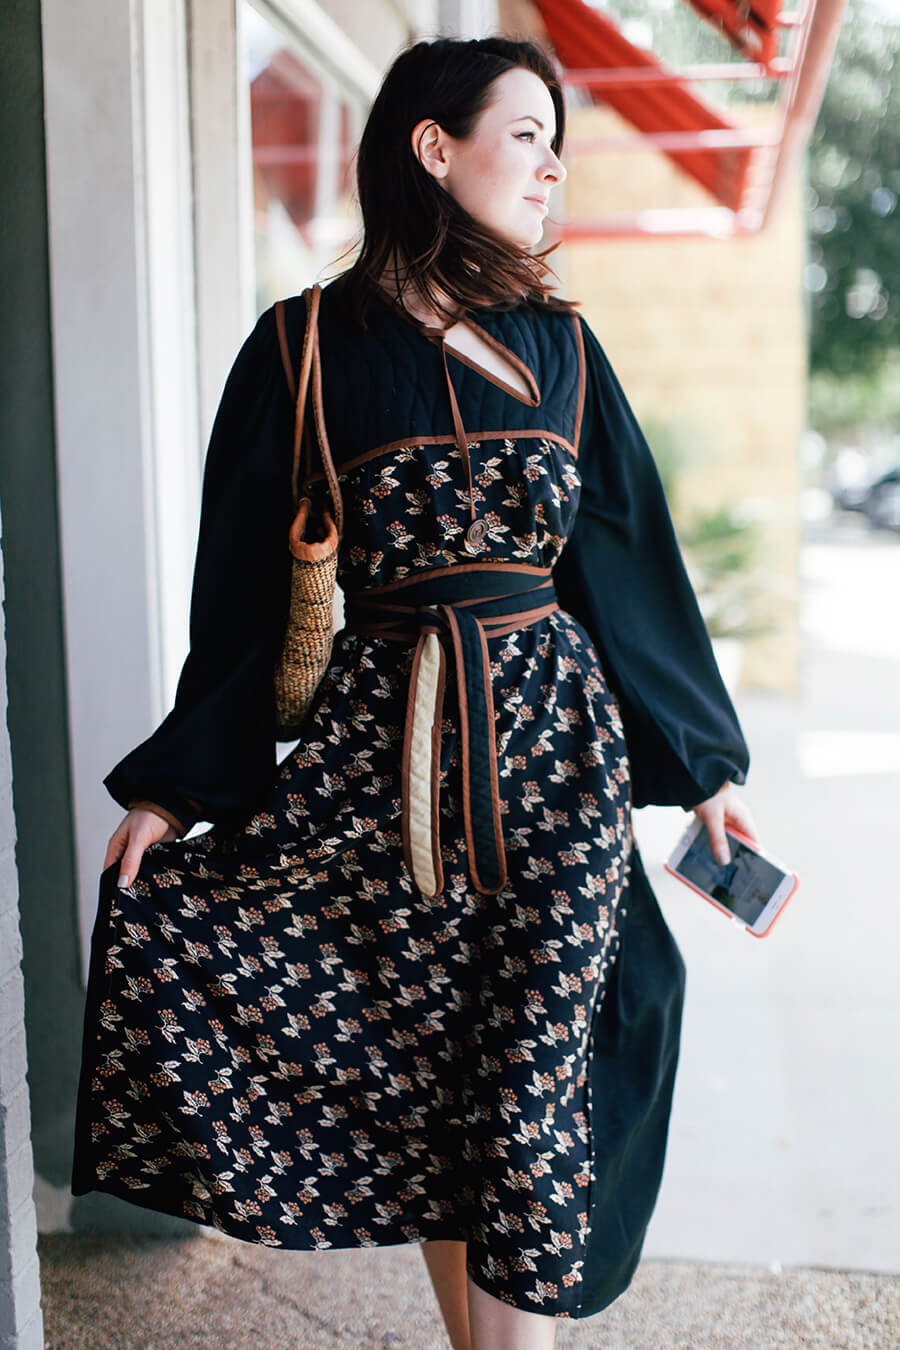 vintage peasant dress @ seaofshoes.com